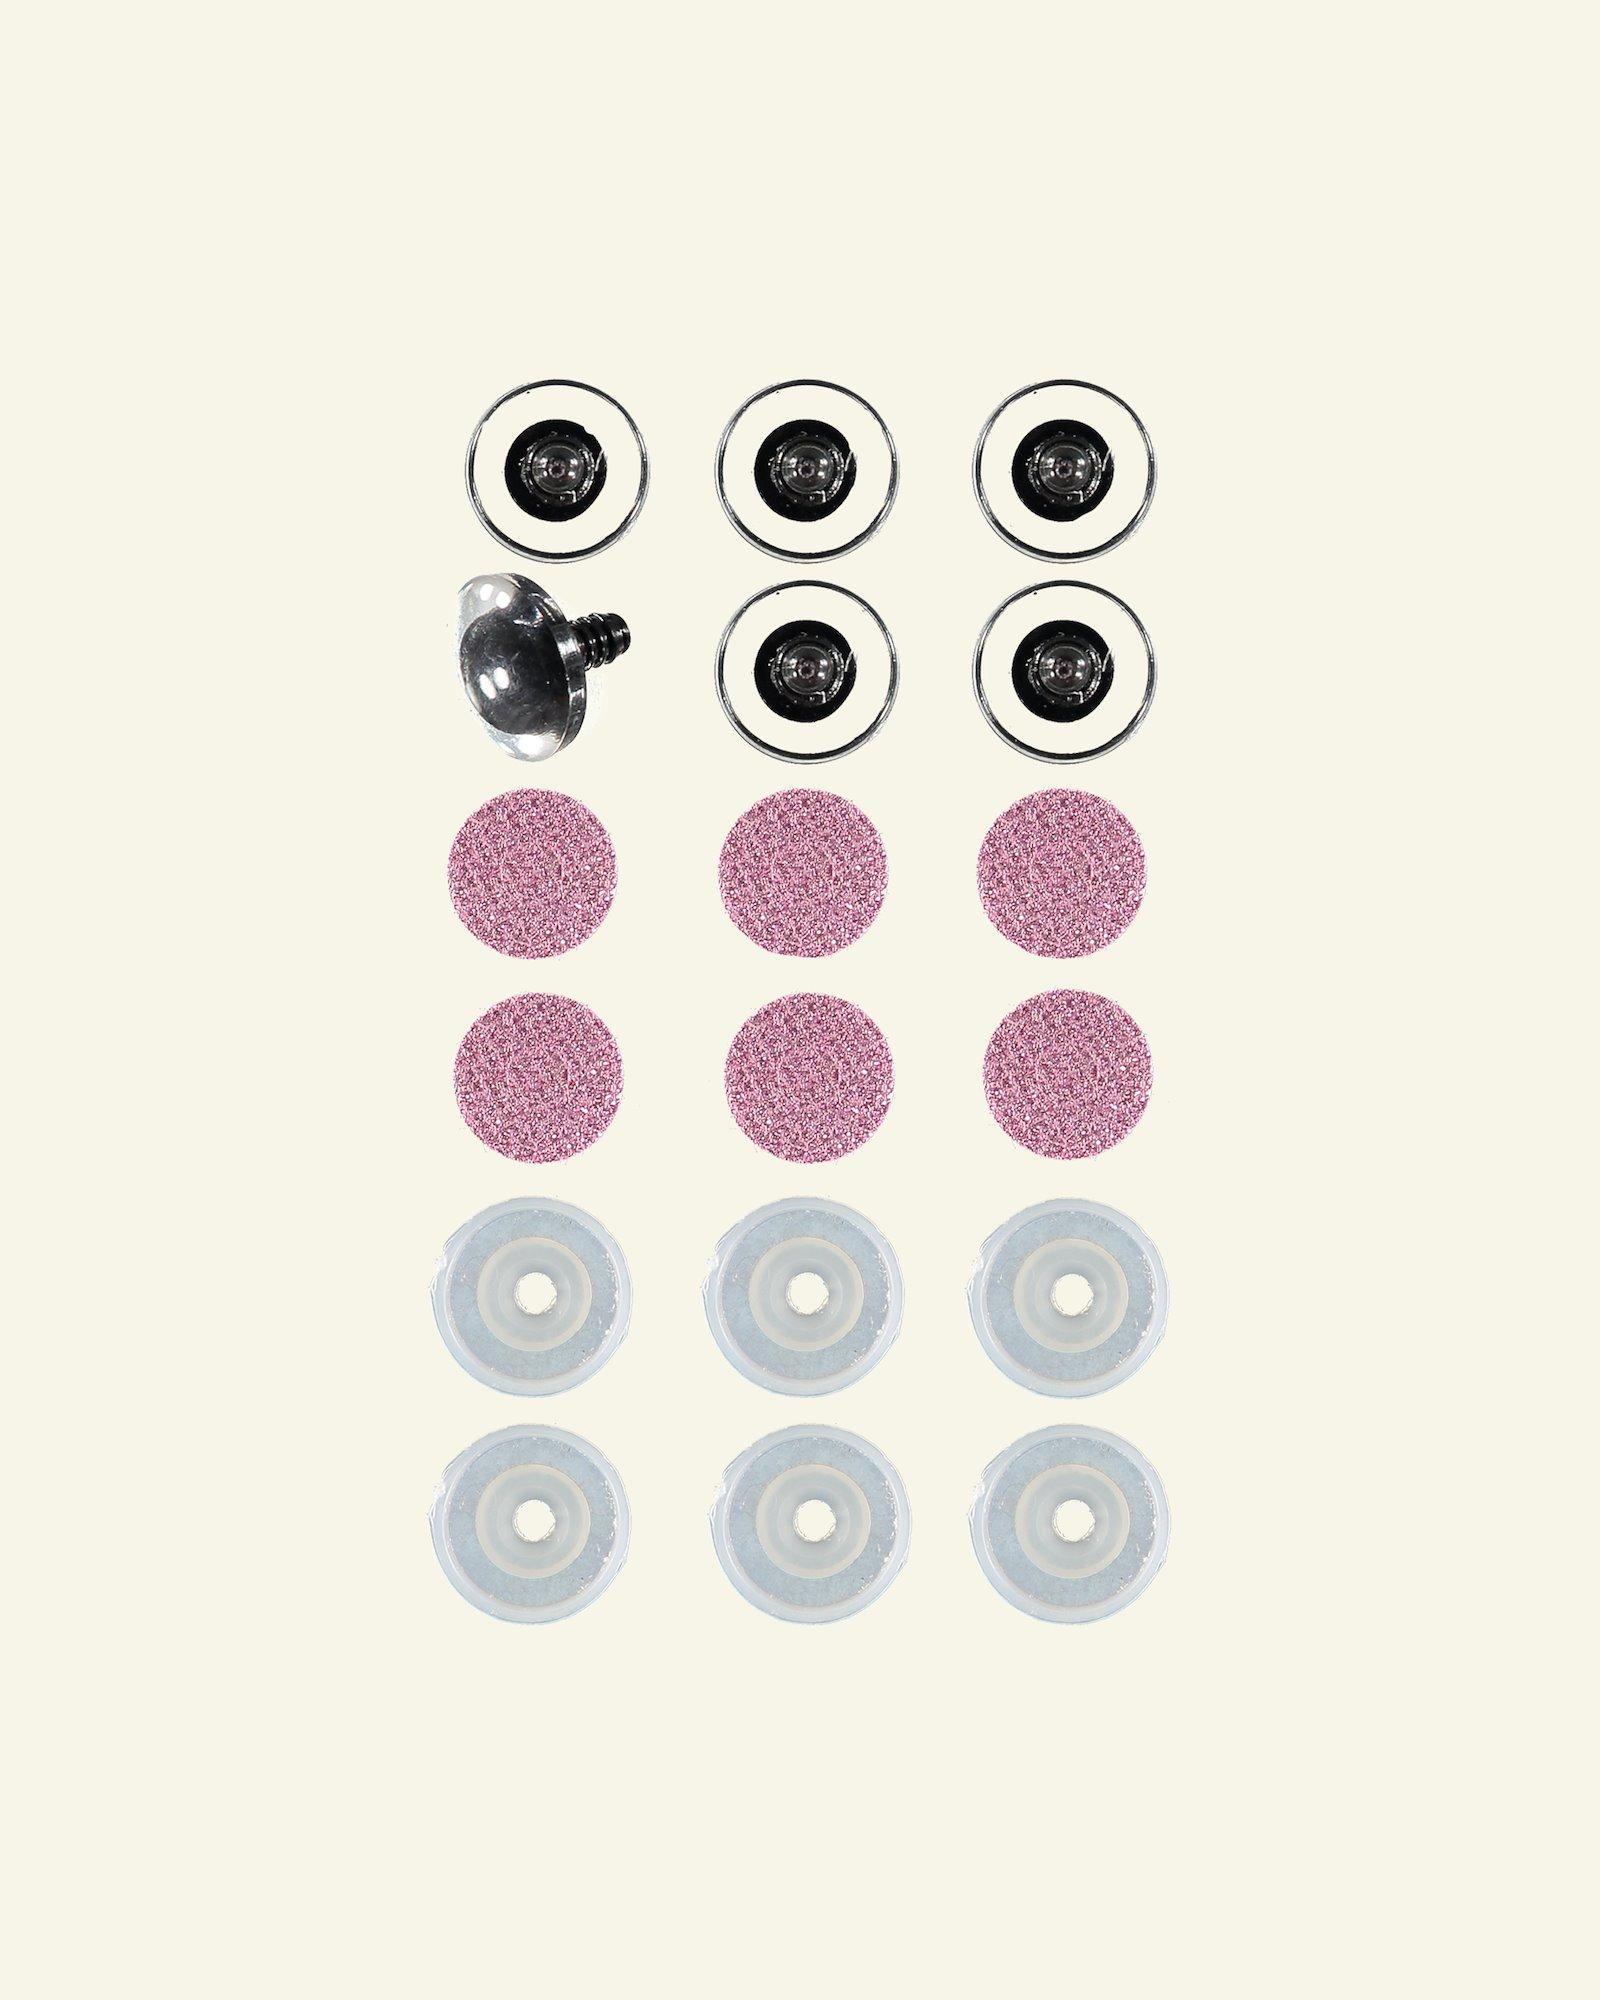 Glitzernde augen 30mm rosa 6 pcs